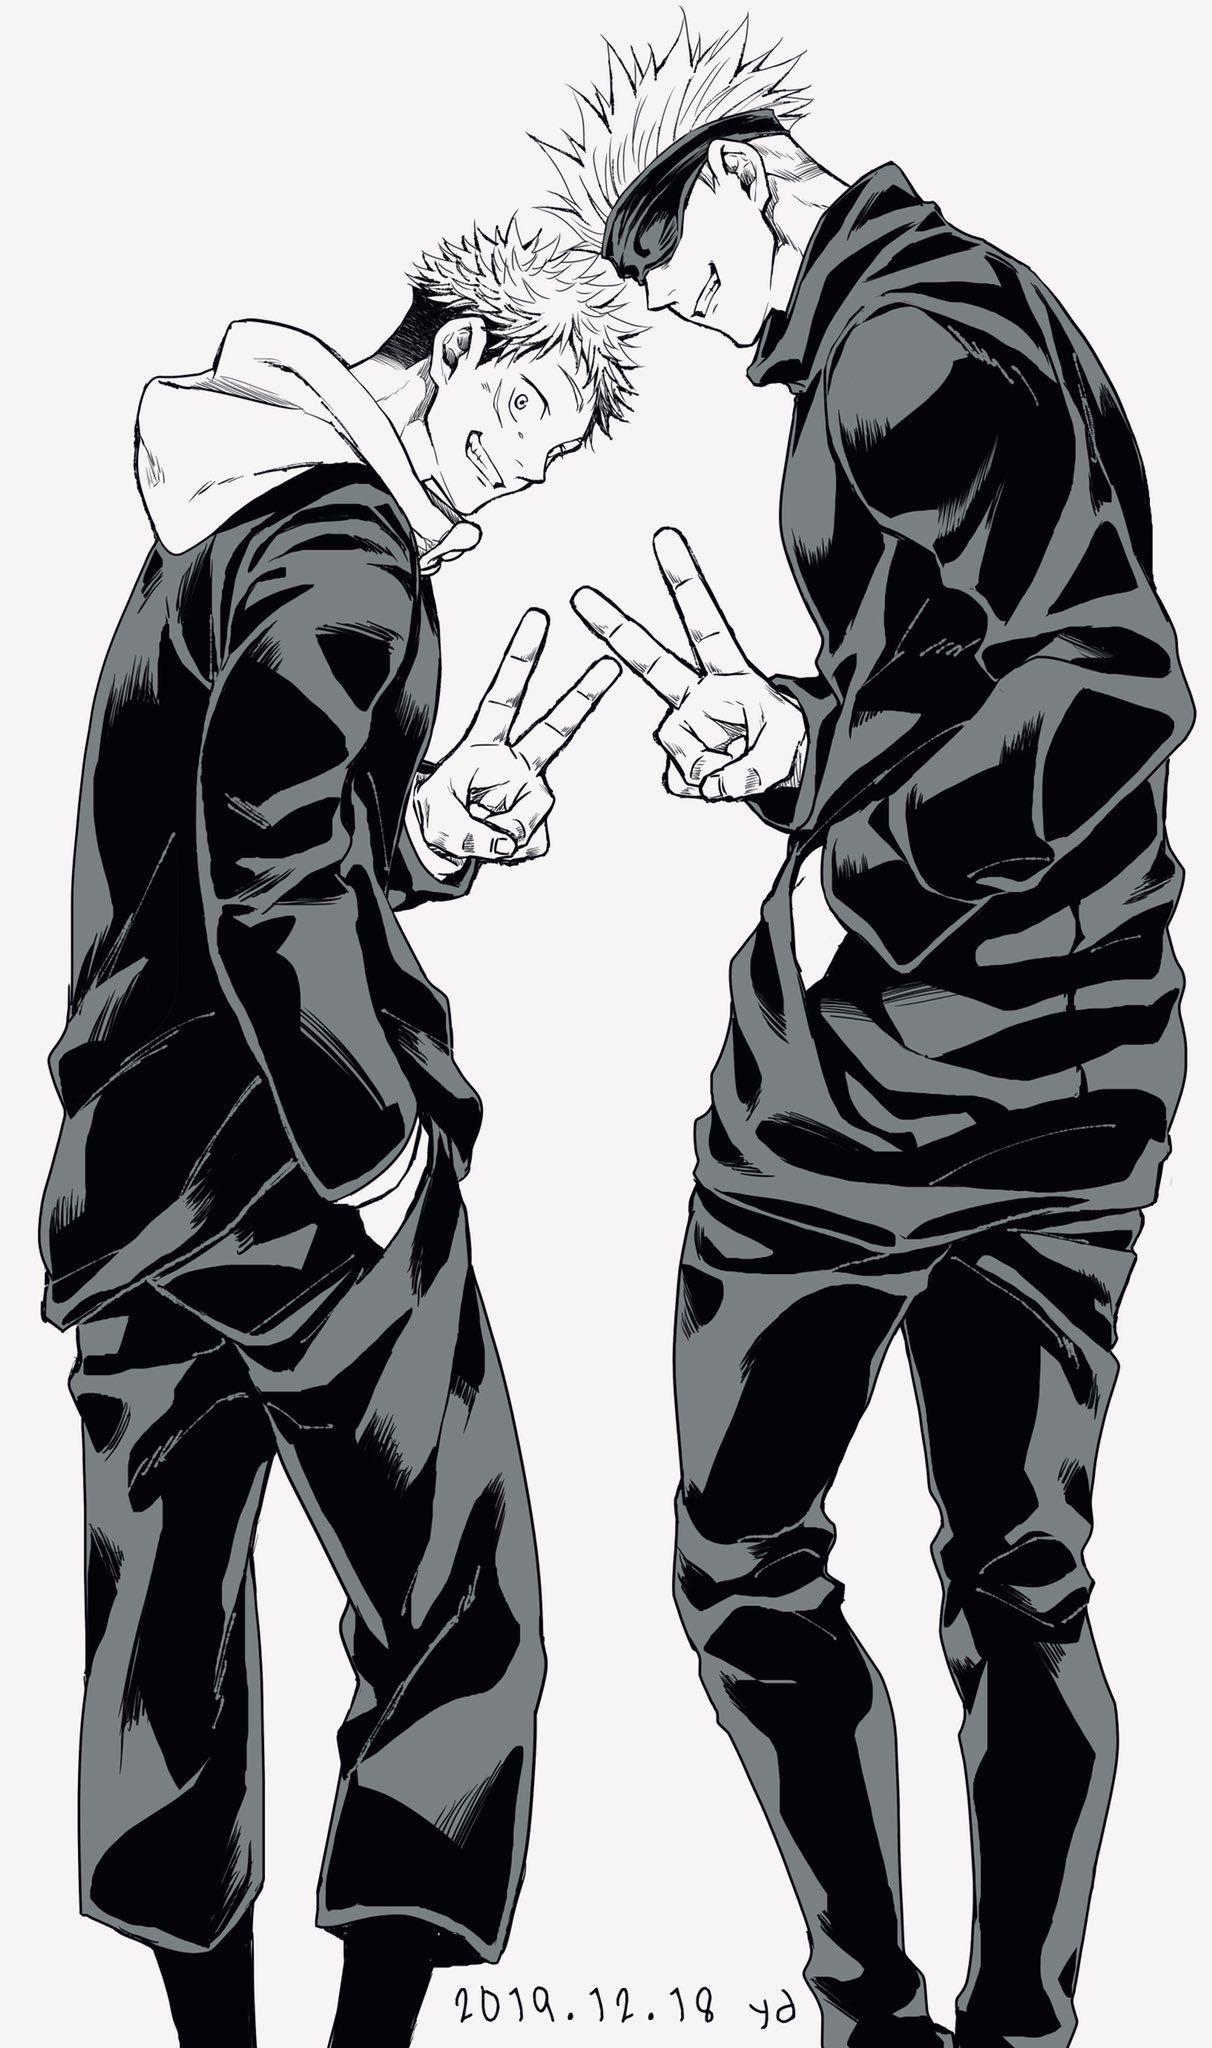 Itadori Yuji And Gojo Satoru In 2021 Anime Wallpaper Anime Background Anime Art